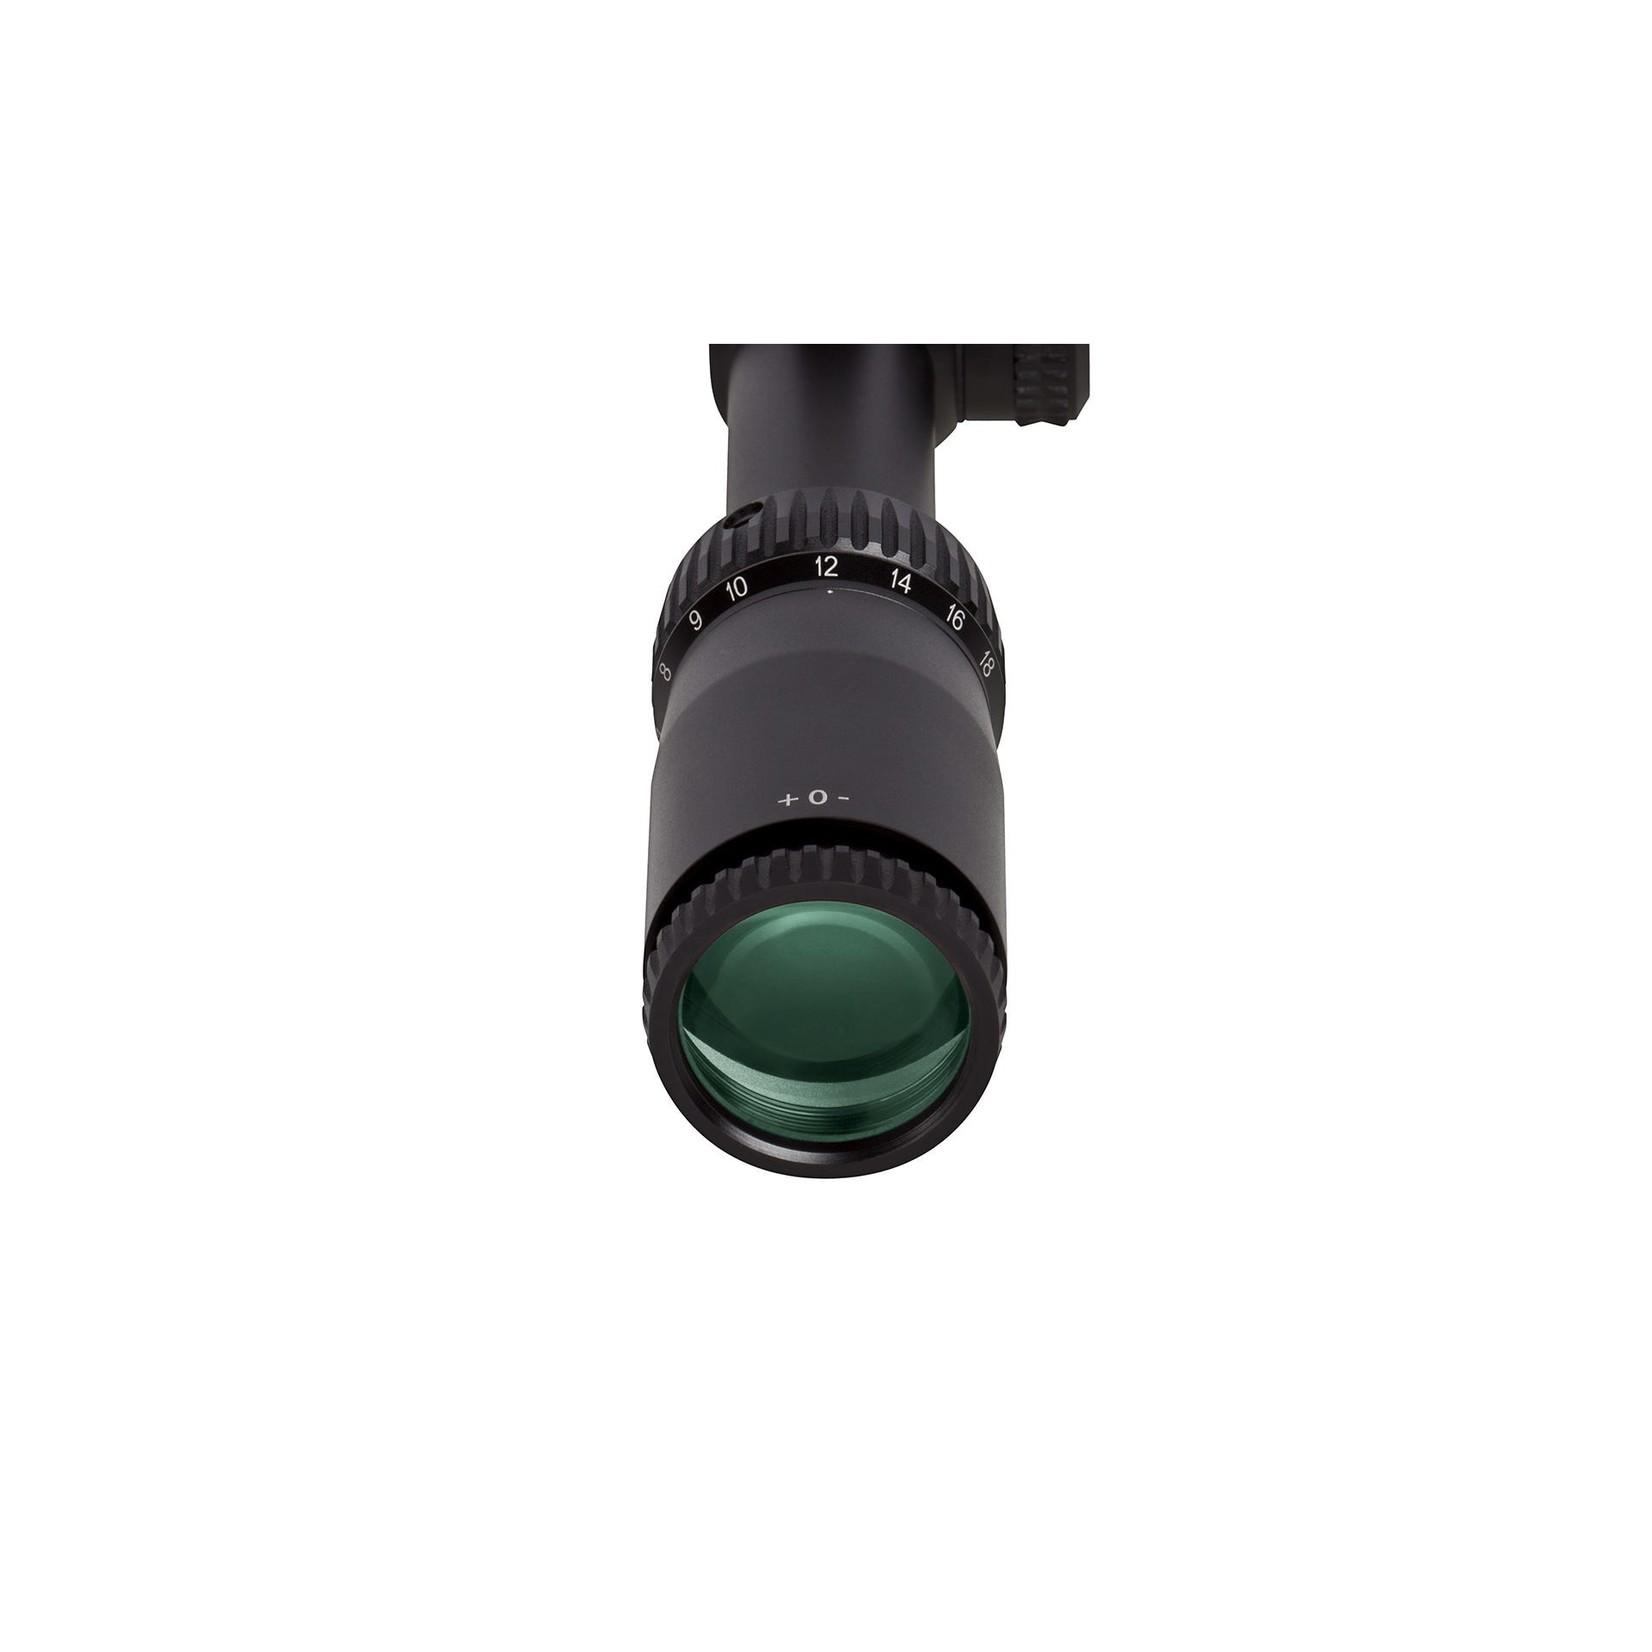 VORTEX Vortex Optics Crossfire II 6-18x44mm AO BDC Scope